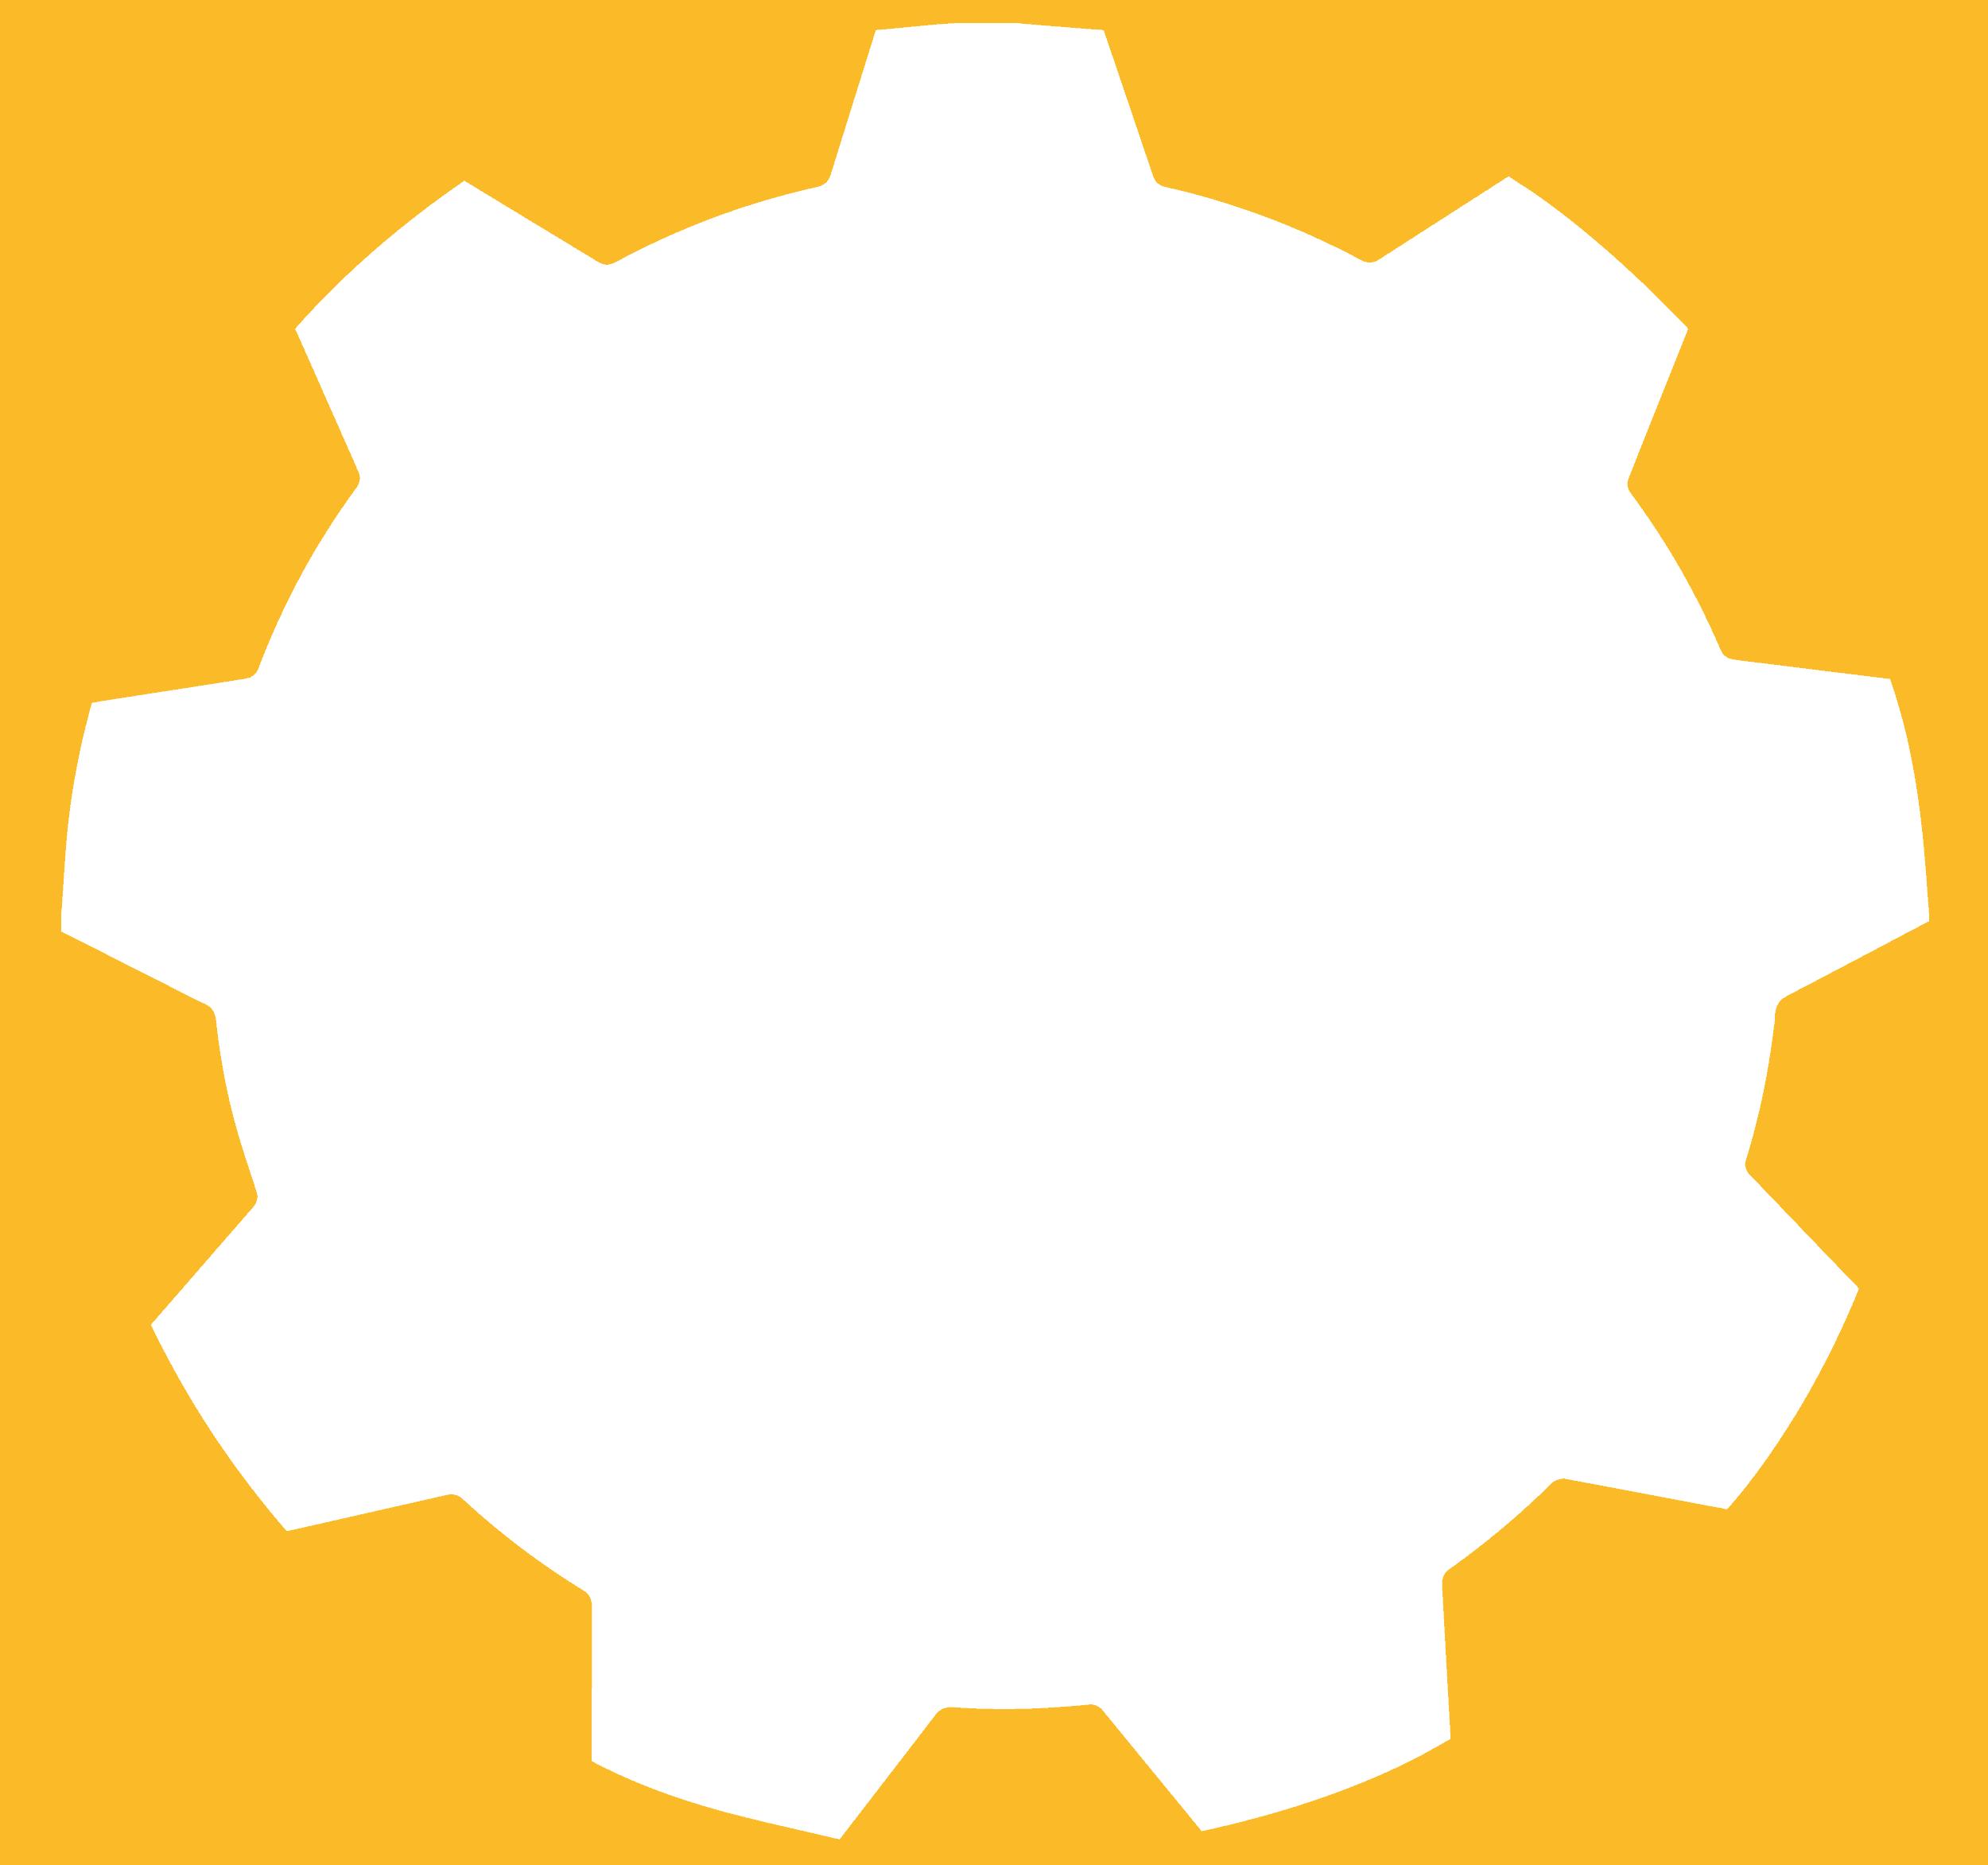 TerrainHopper Gear